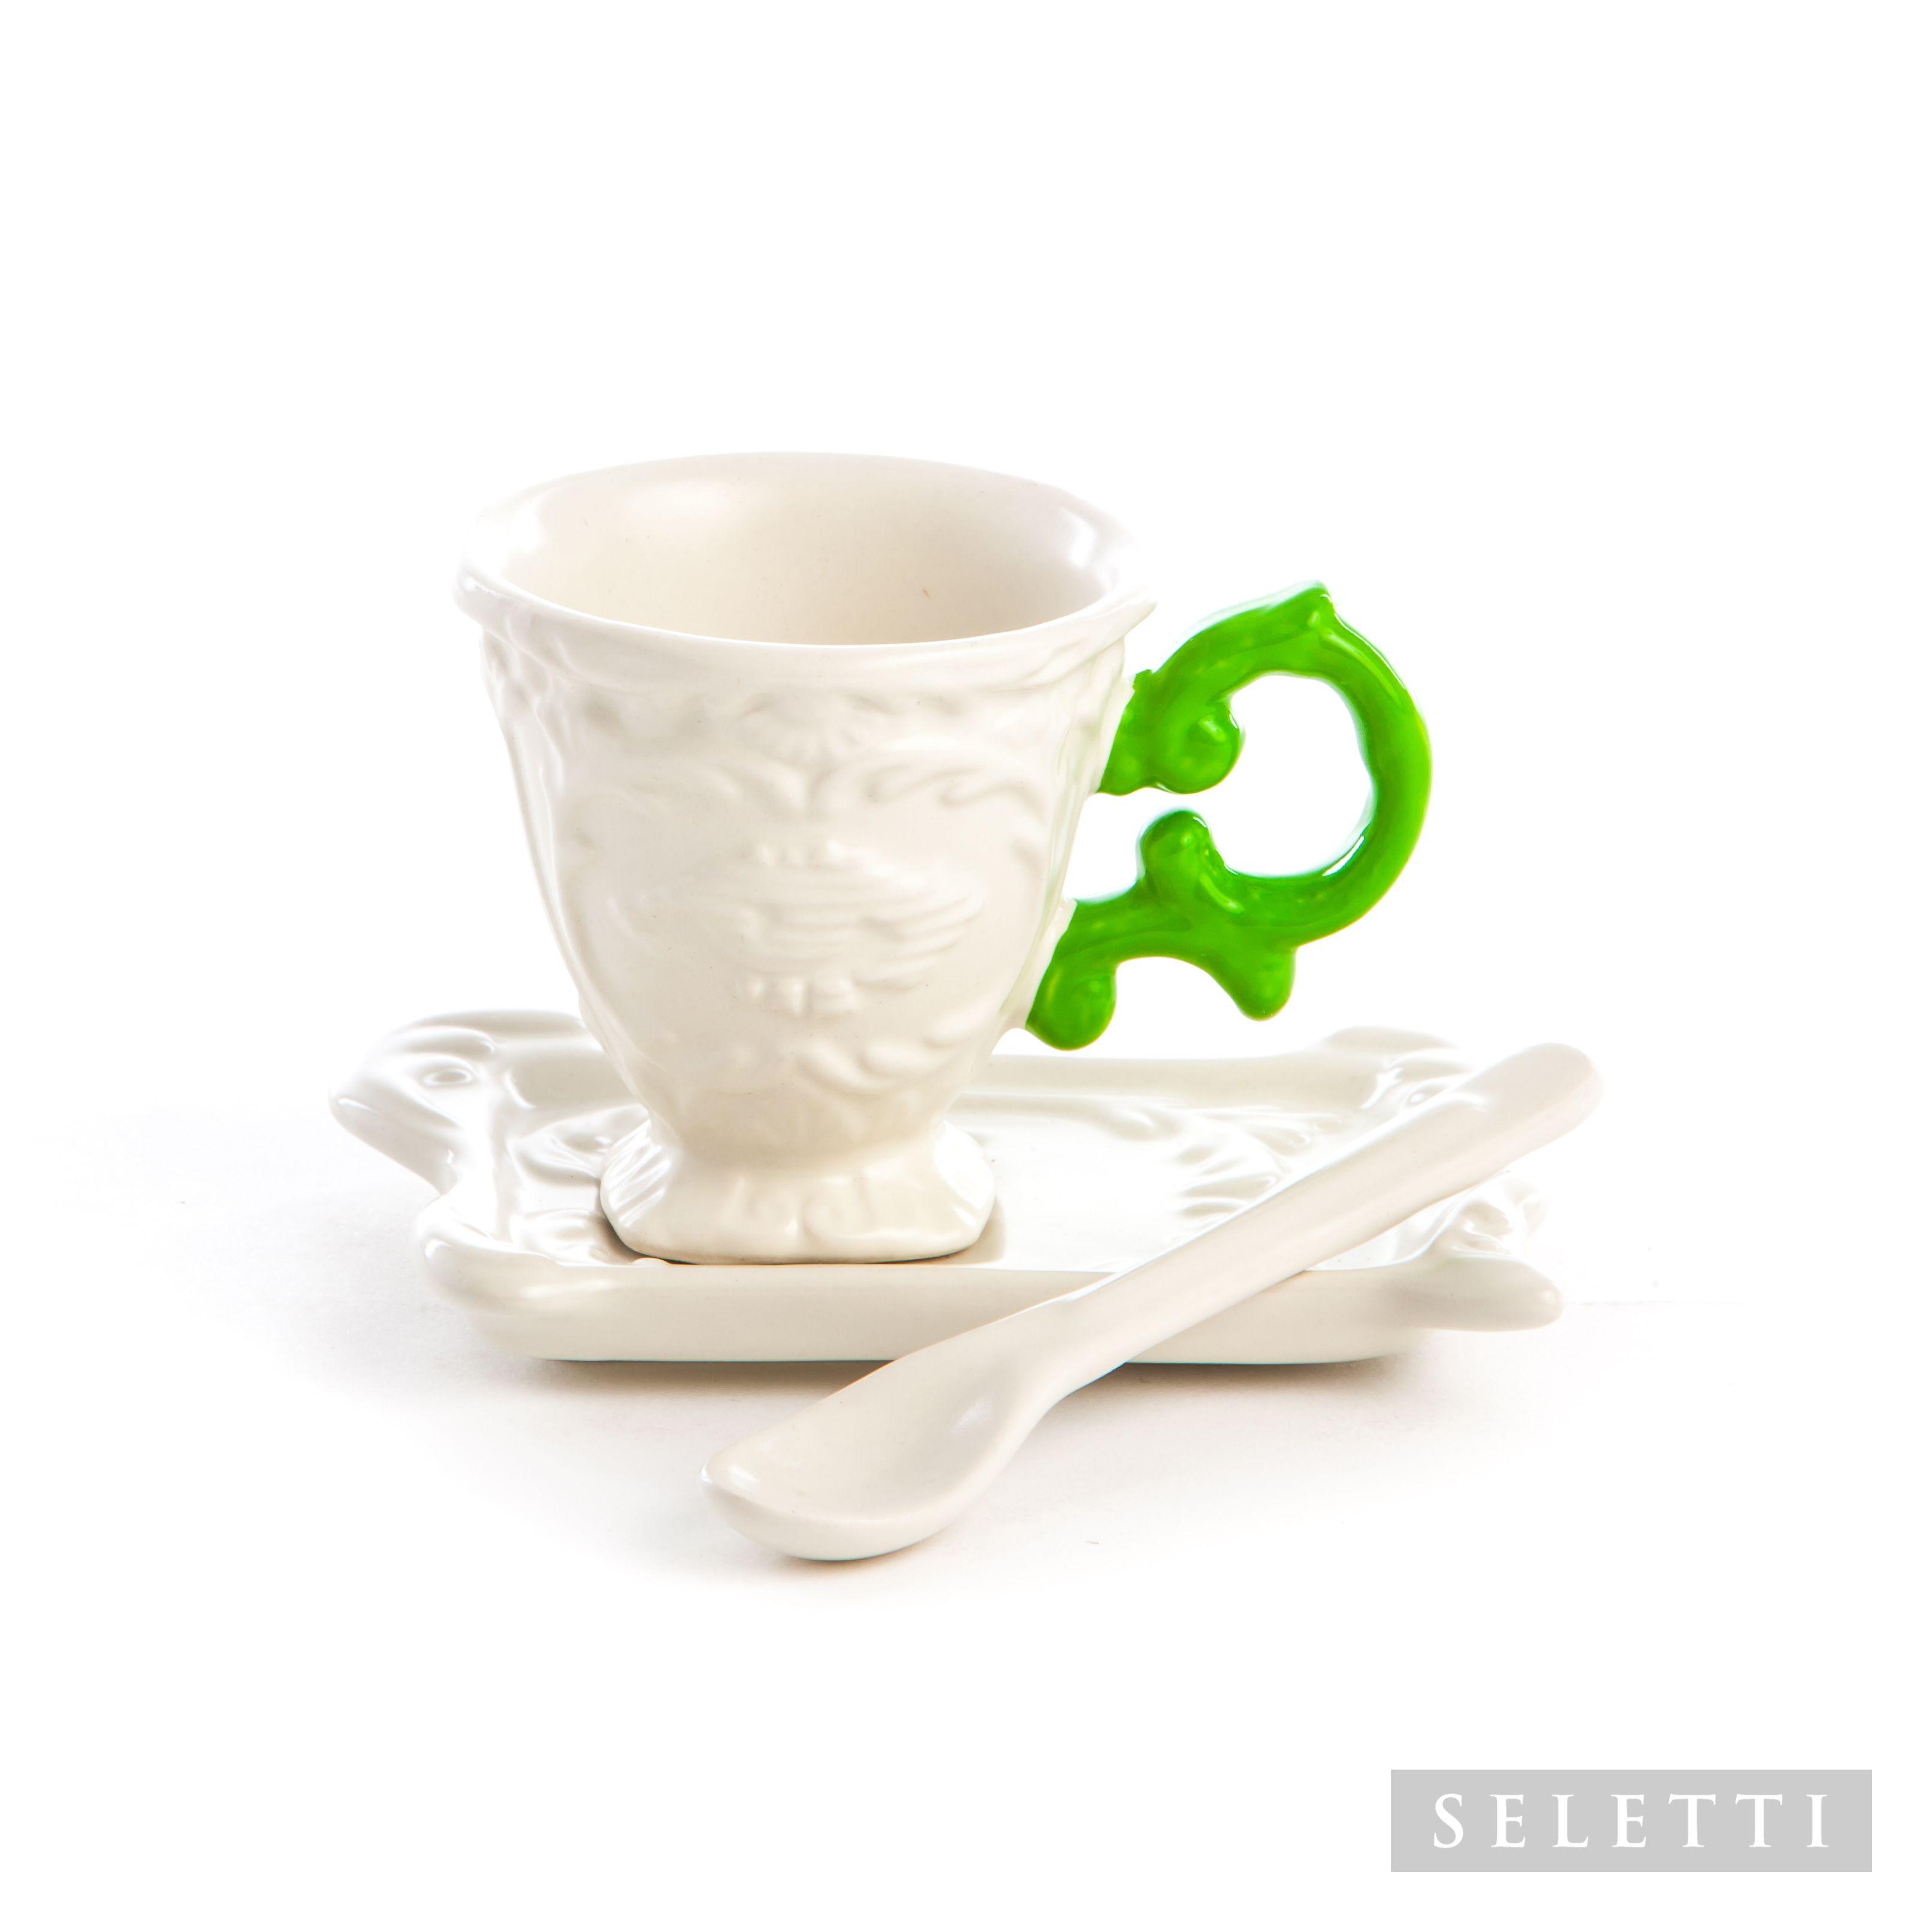 Seletti | Coffee | 09859VERDE